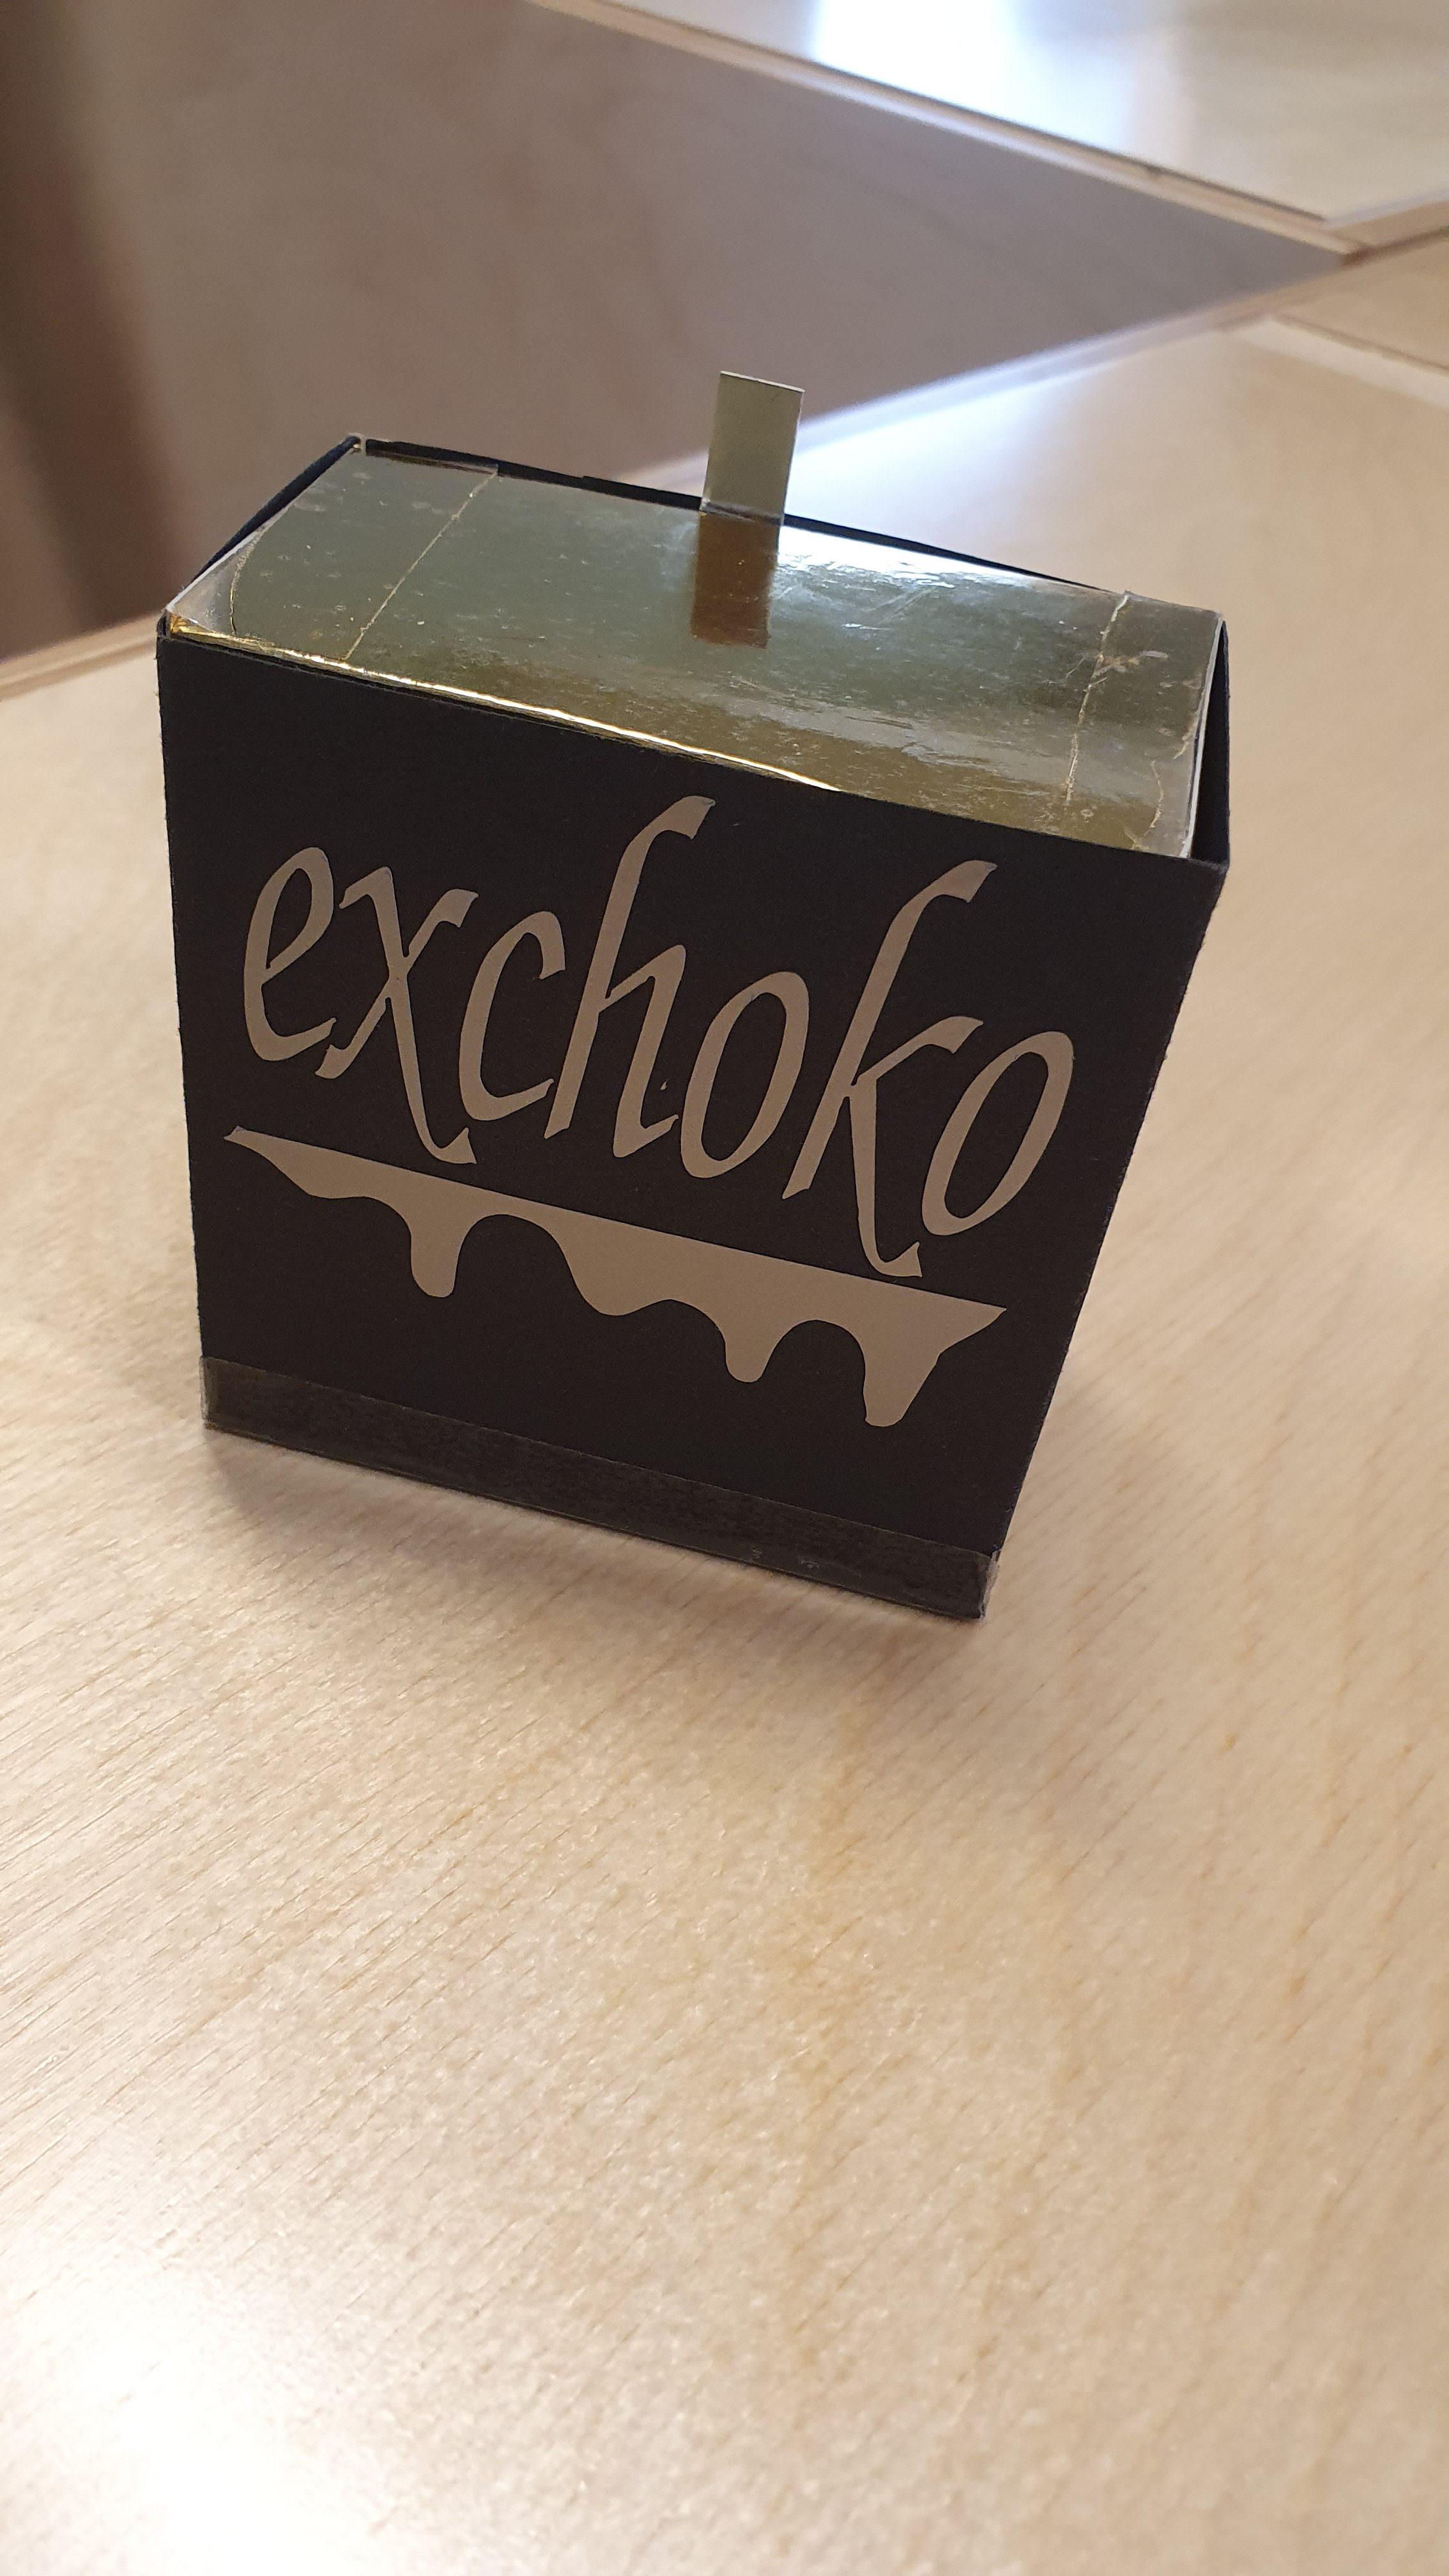 Design en æske til chokolade